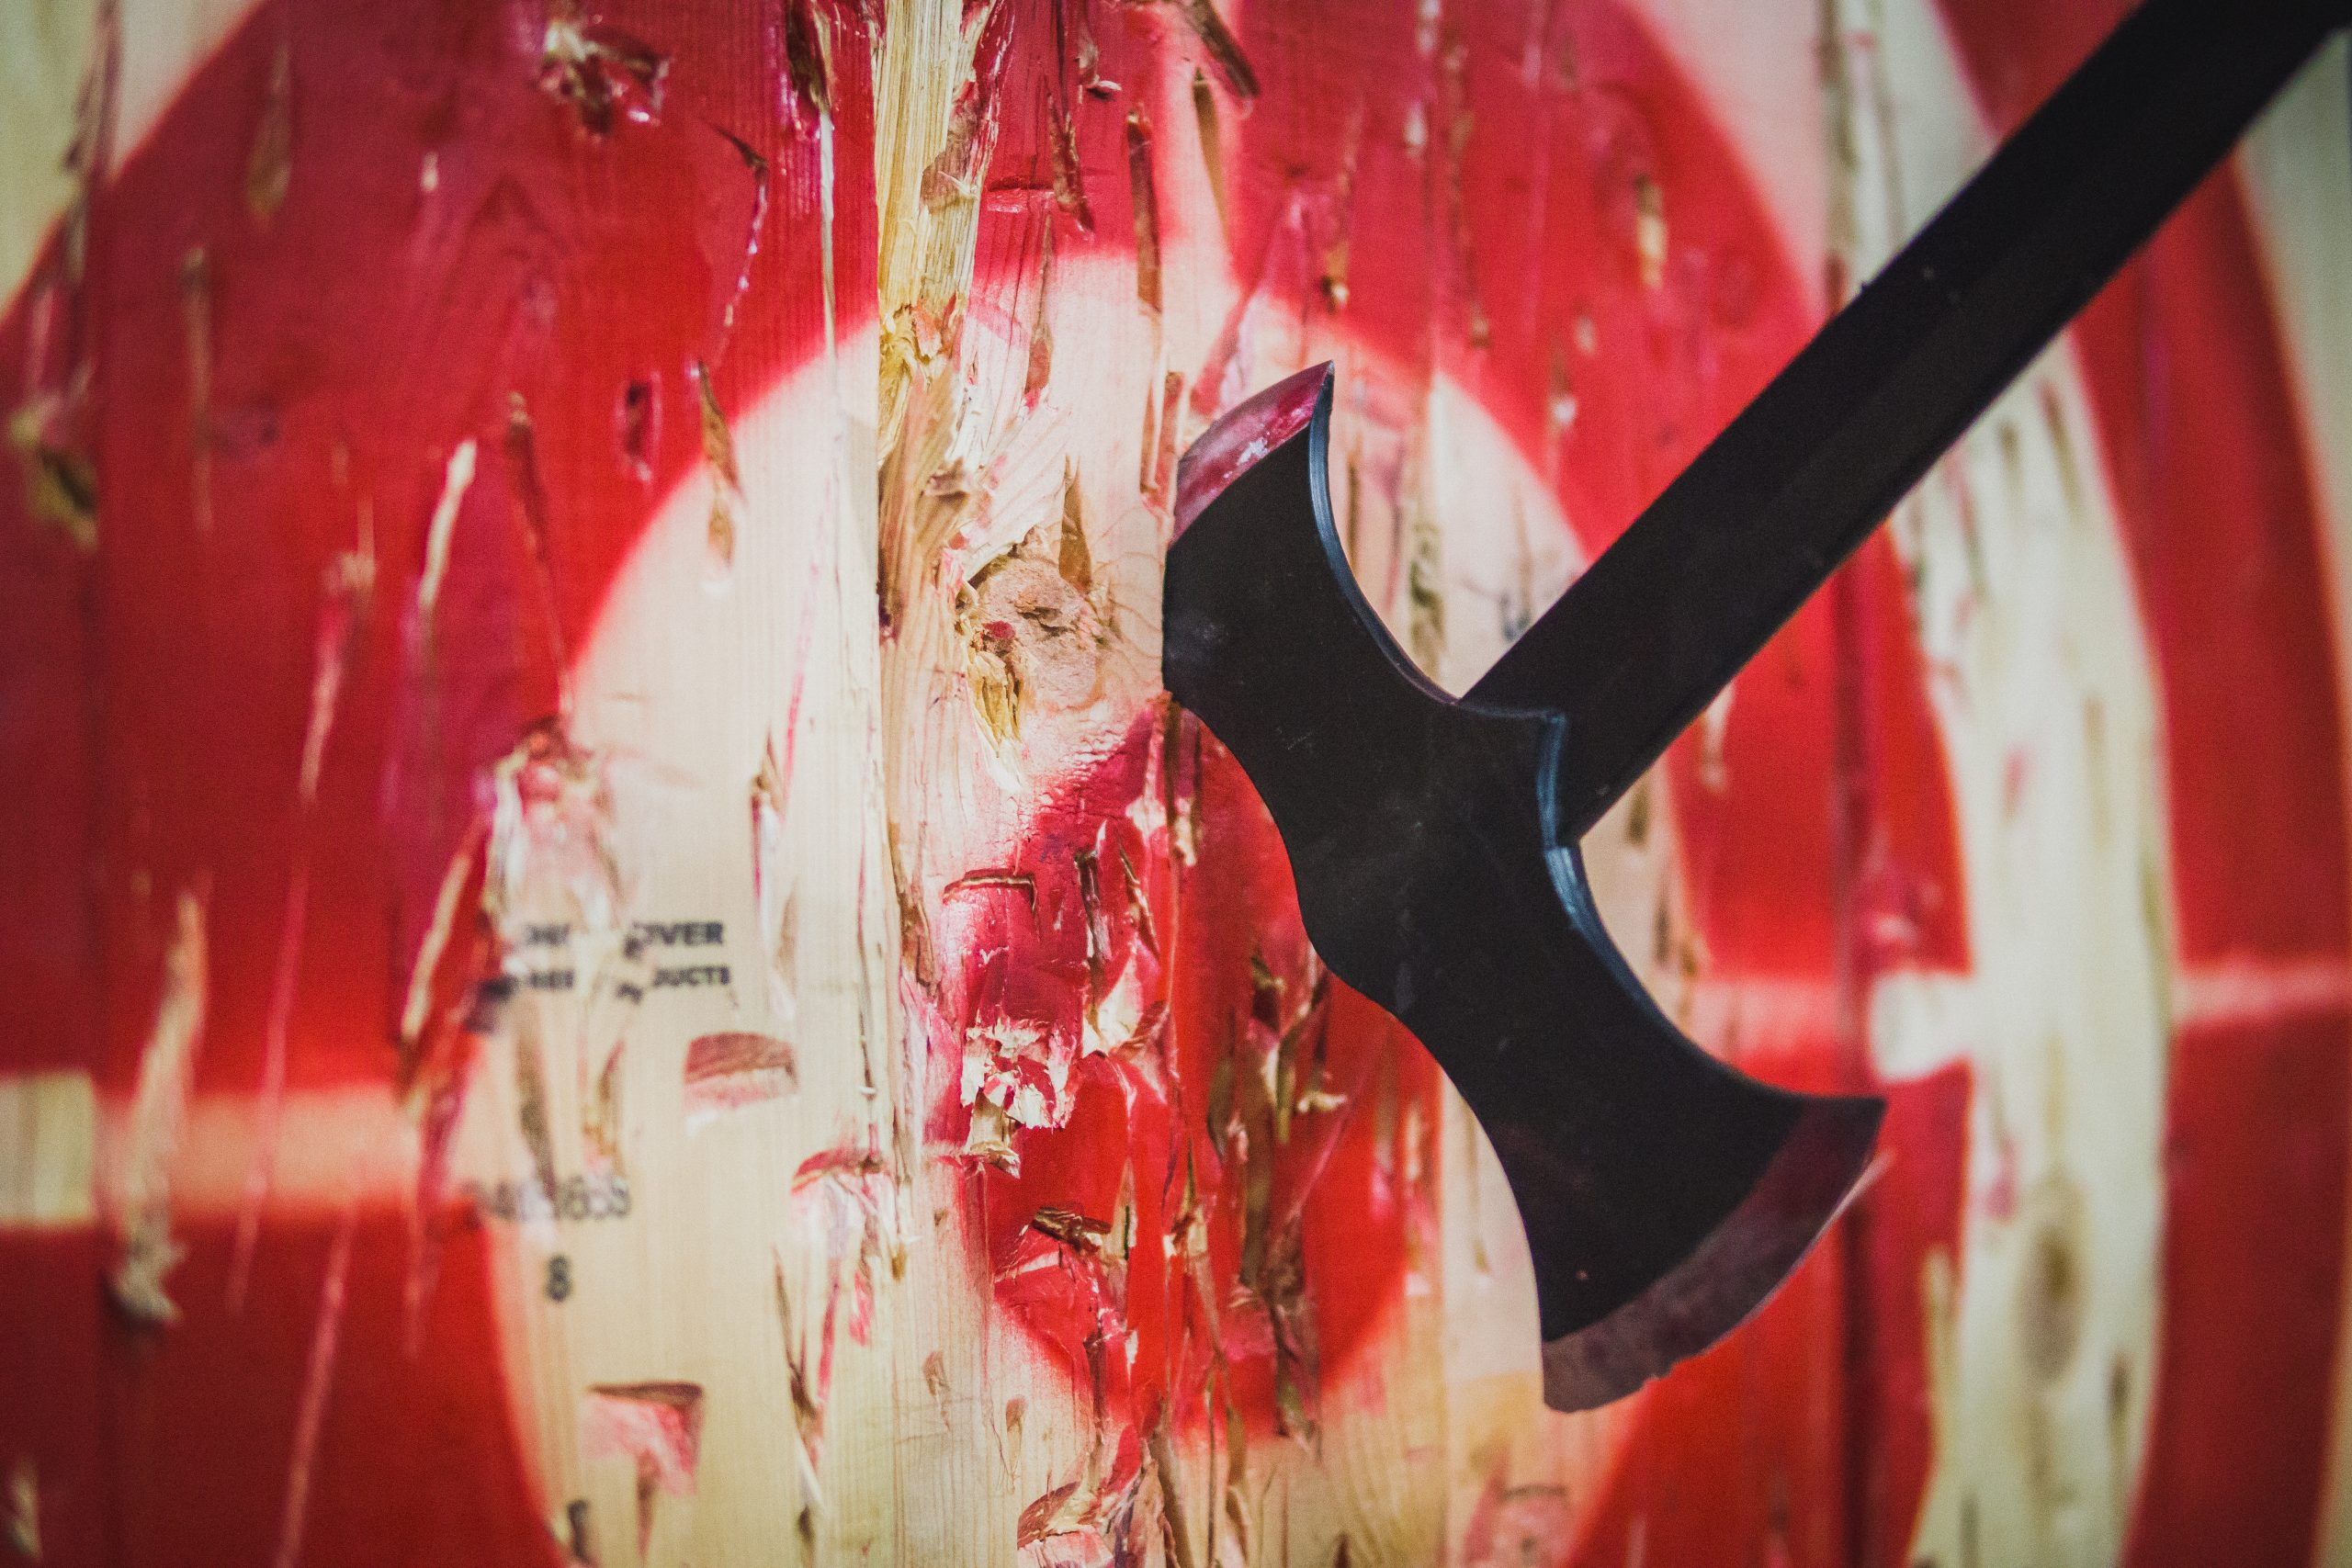 Axe in Wood Target